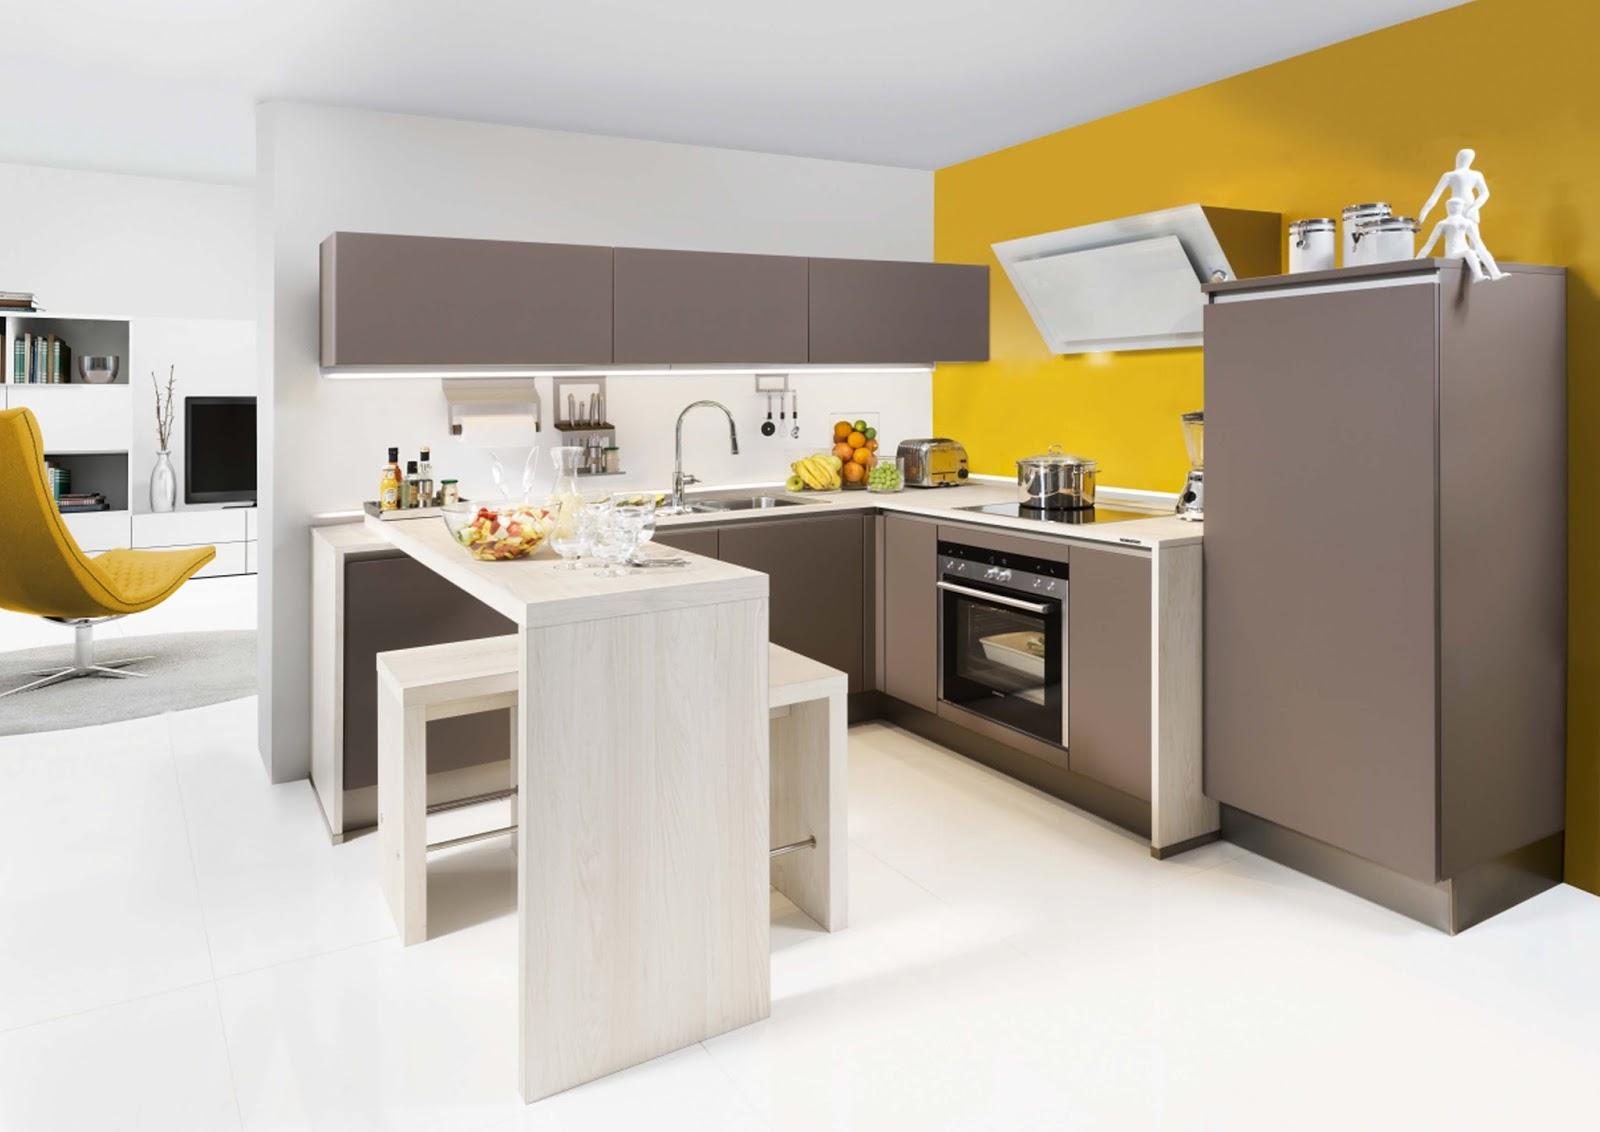 Pic of u shaped kitchen sharp home design - Nolte home studio ...